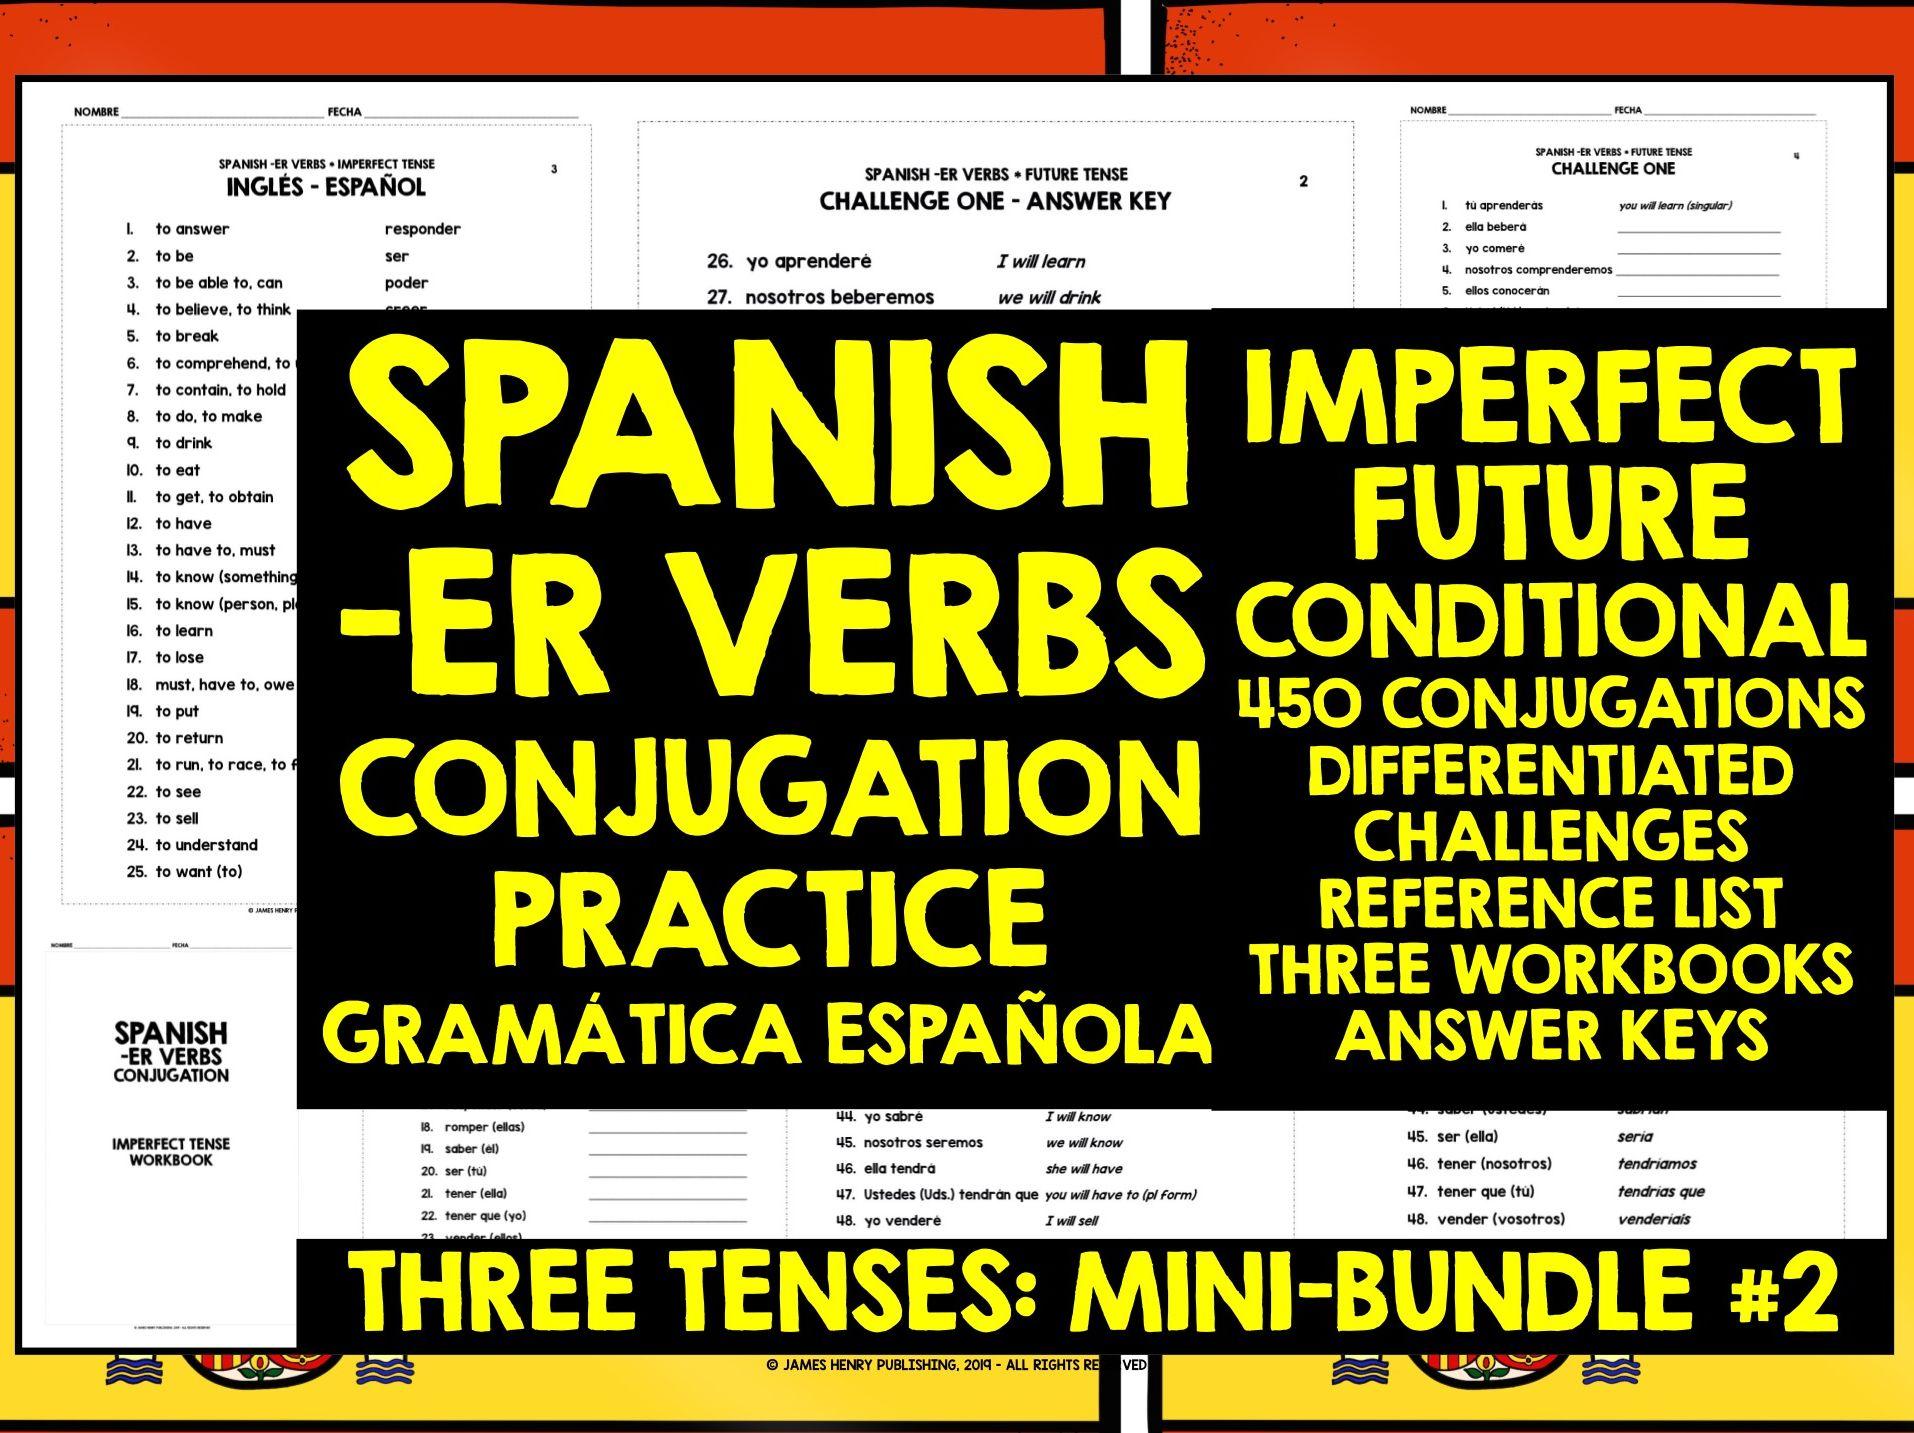 SPANISH ER VERBS CONJUGATION WORKBOOKS #2